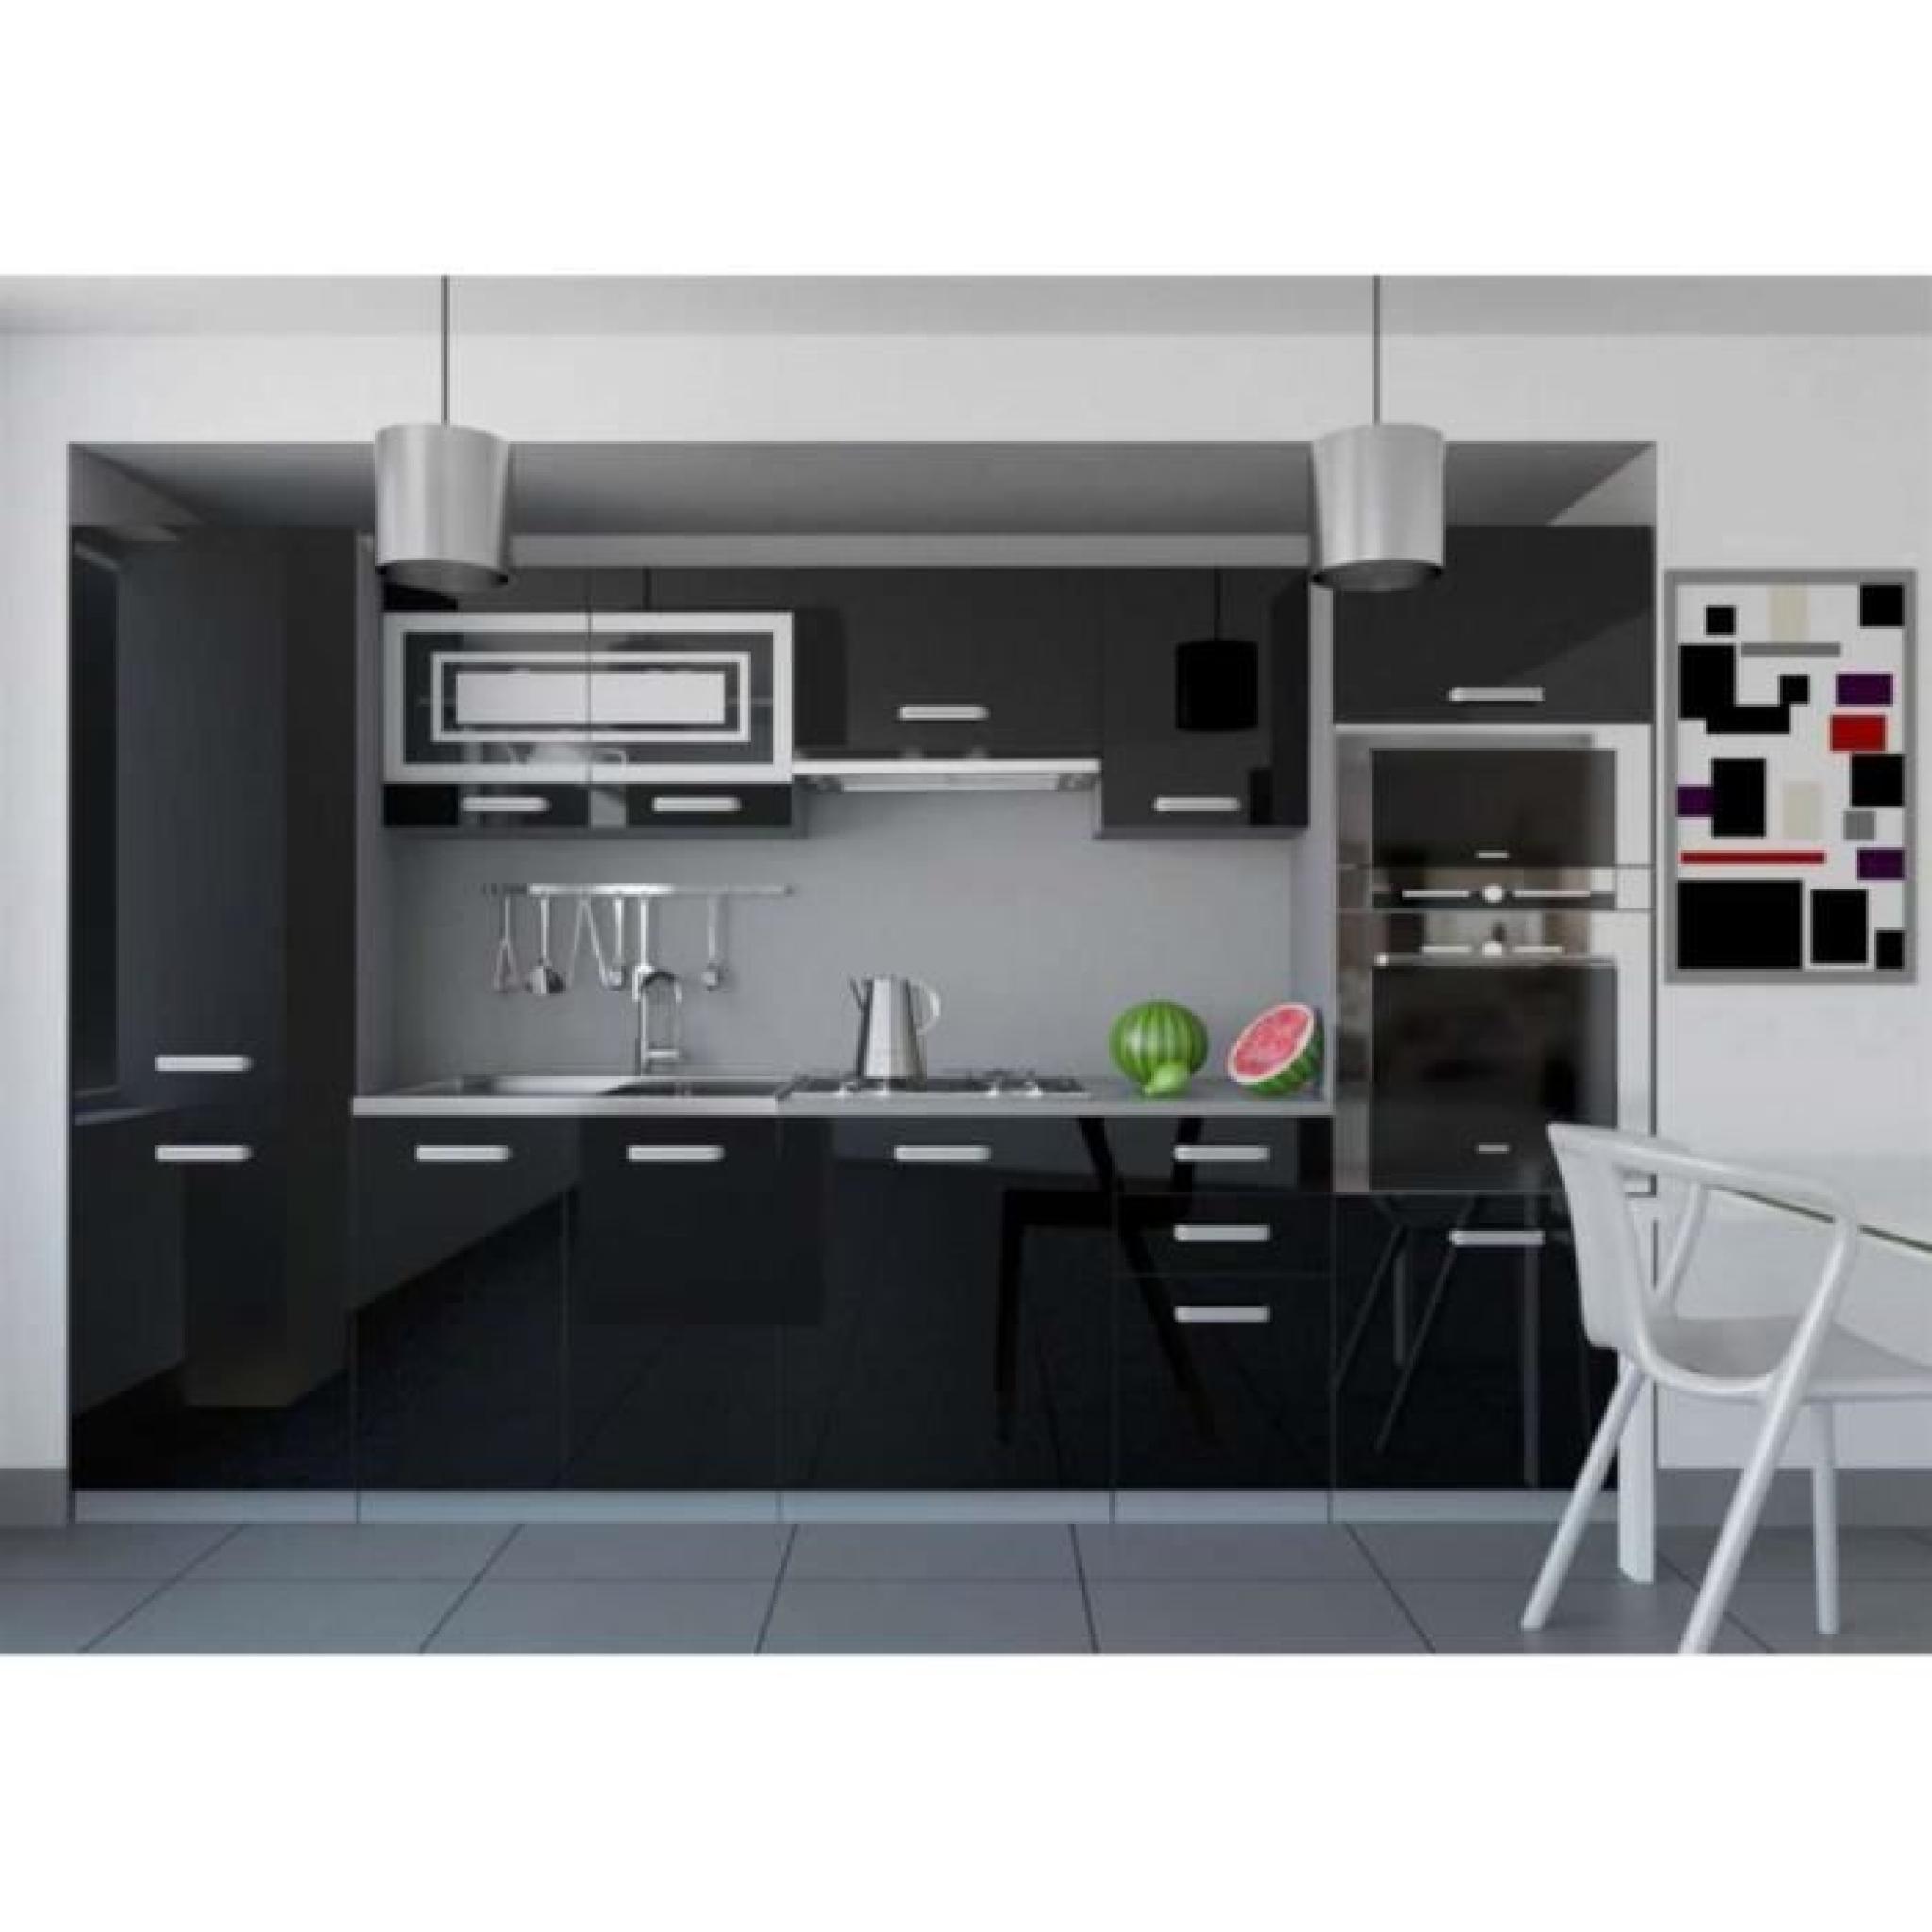 conforama valet de chambre portant vetement ikea portant. Black Bedroom Furniture Sets. Home Design Ideas